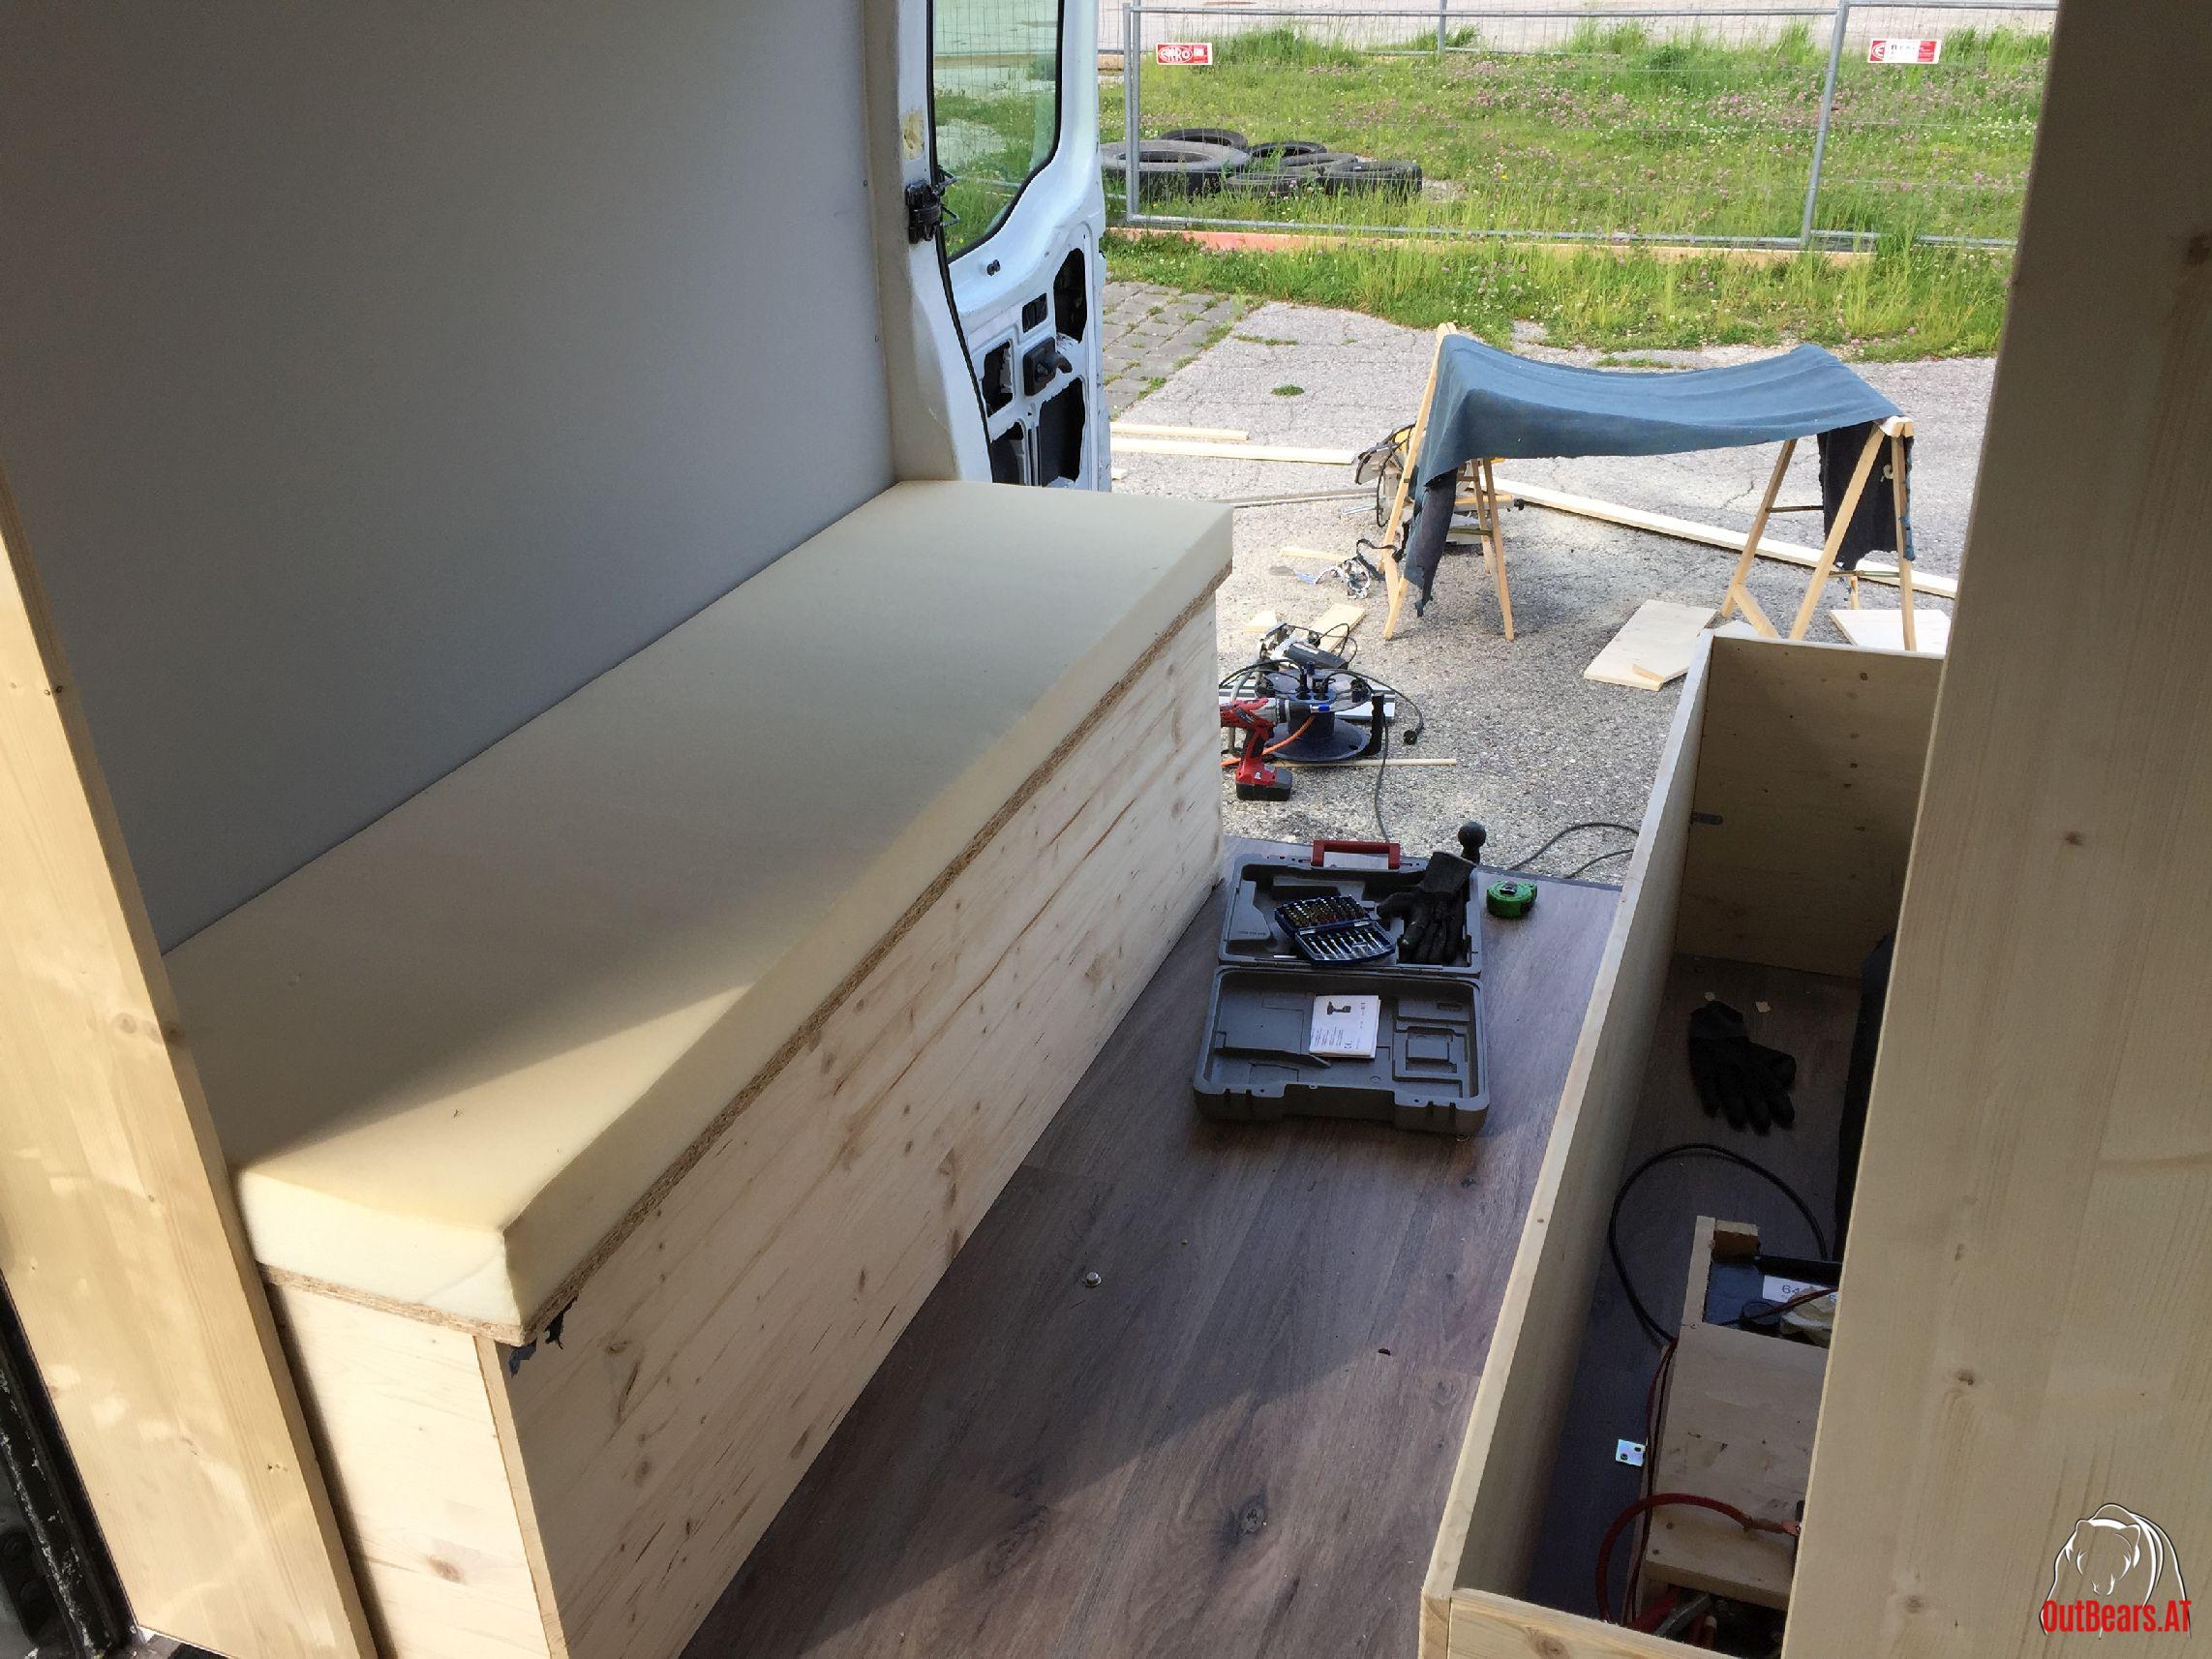 m bel im bus sitzbank renault master outbears campingoutbears camping. Black Bedroom Furniture Sets. Home Design Ideas